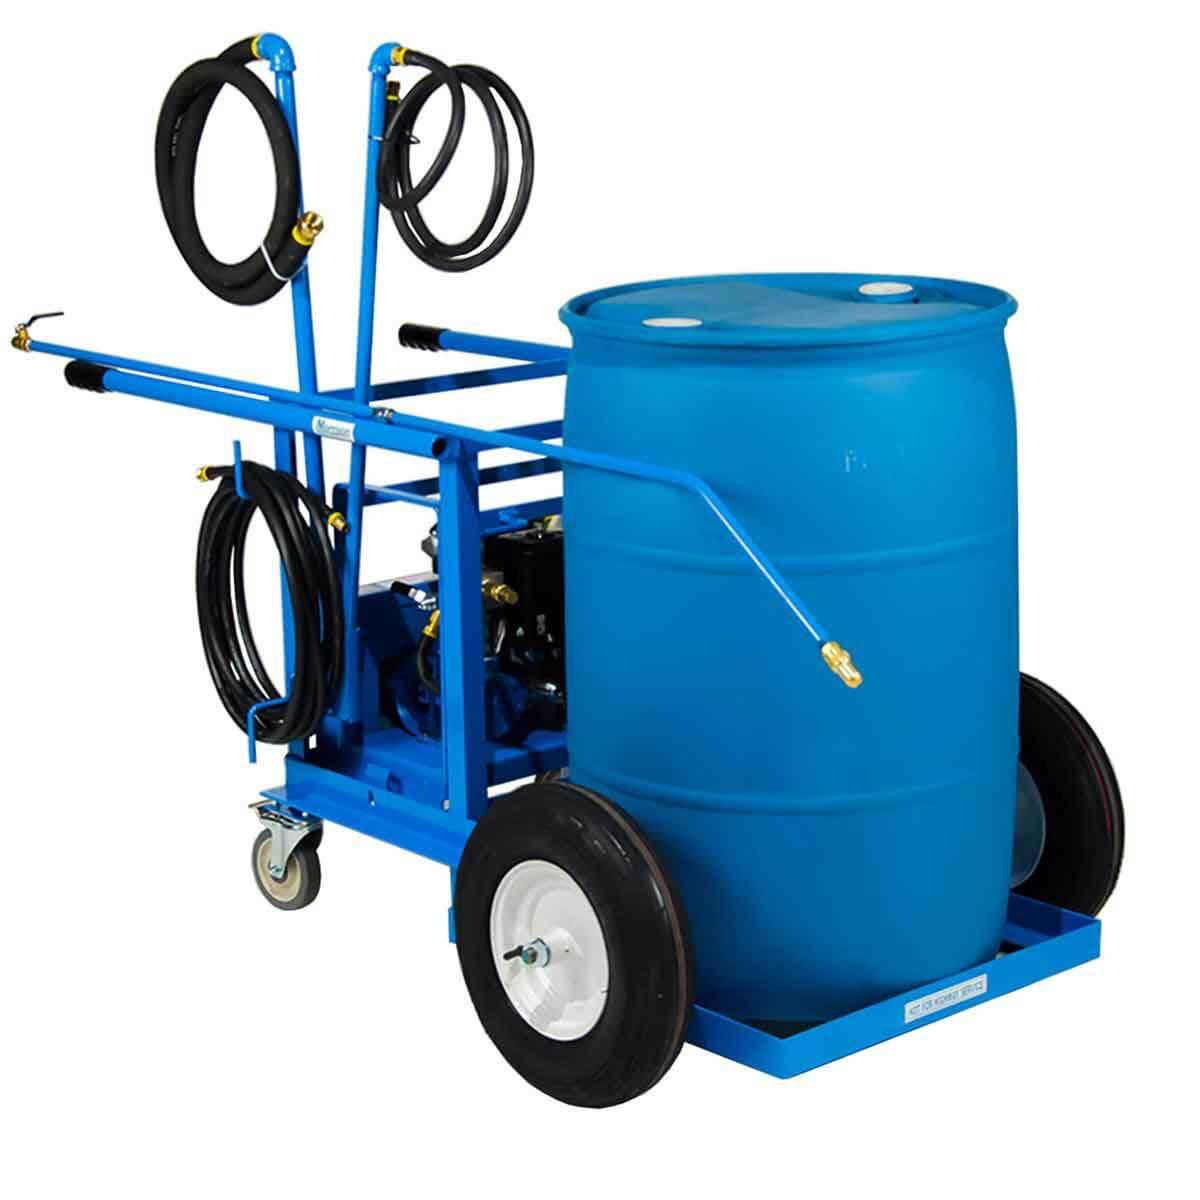 Bartell Power Sprayer honda gas